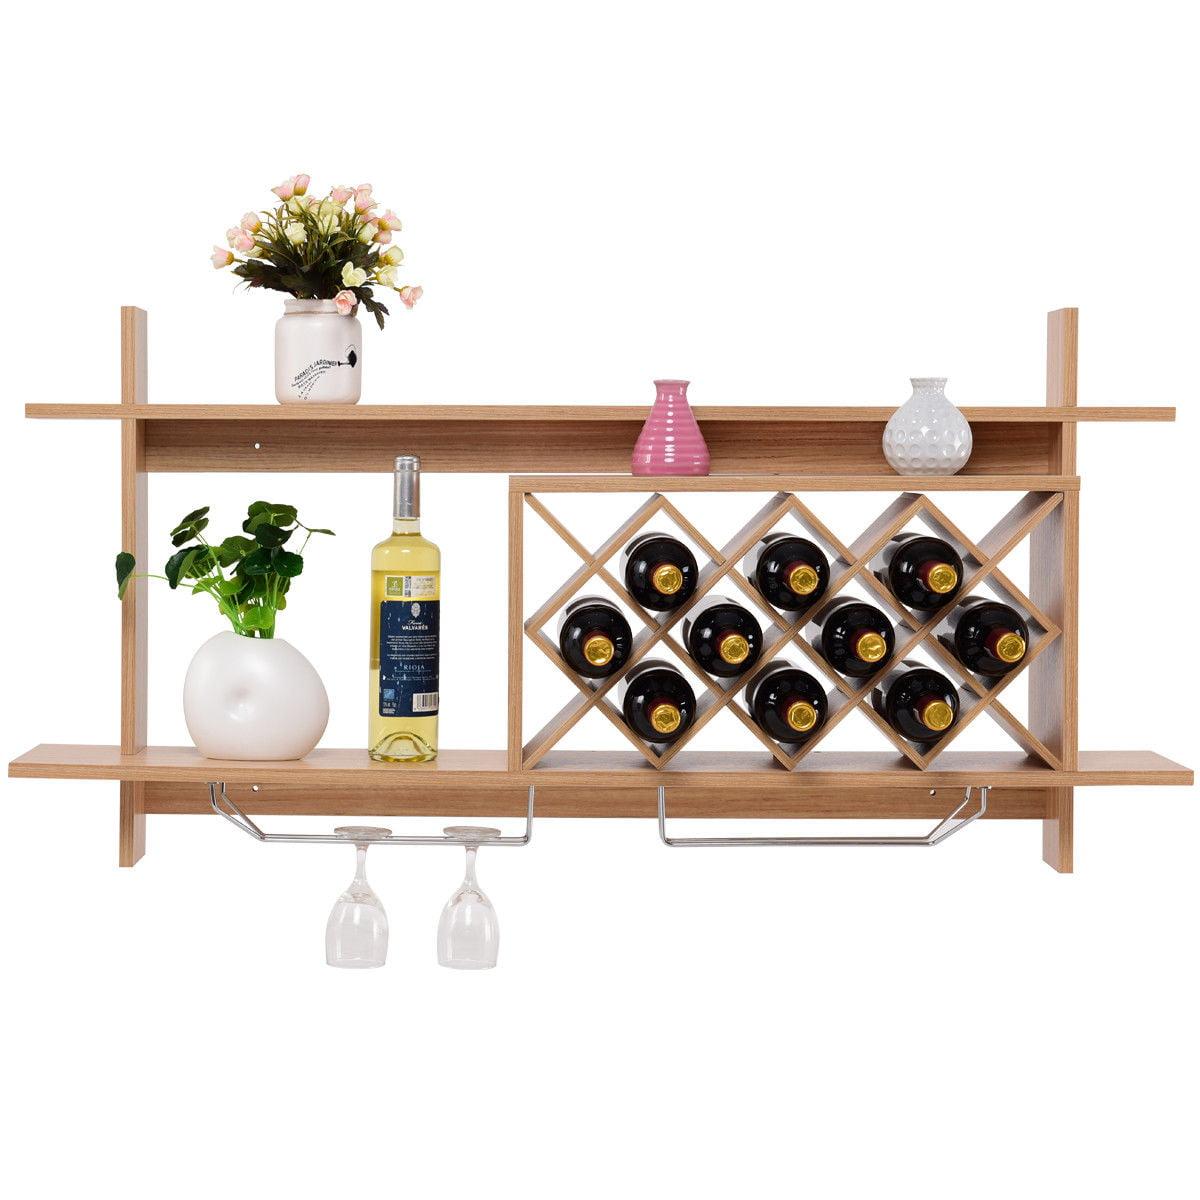 Gymax Wall Mount Wine Rack Organizer With Glass Holder Storage